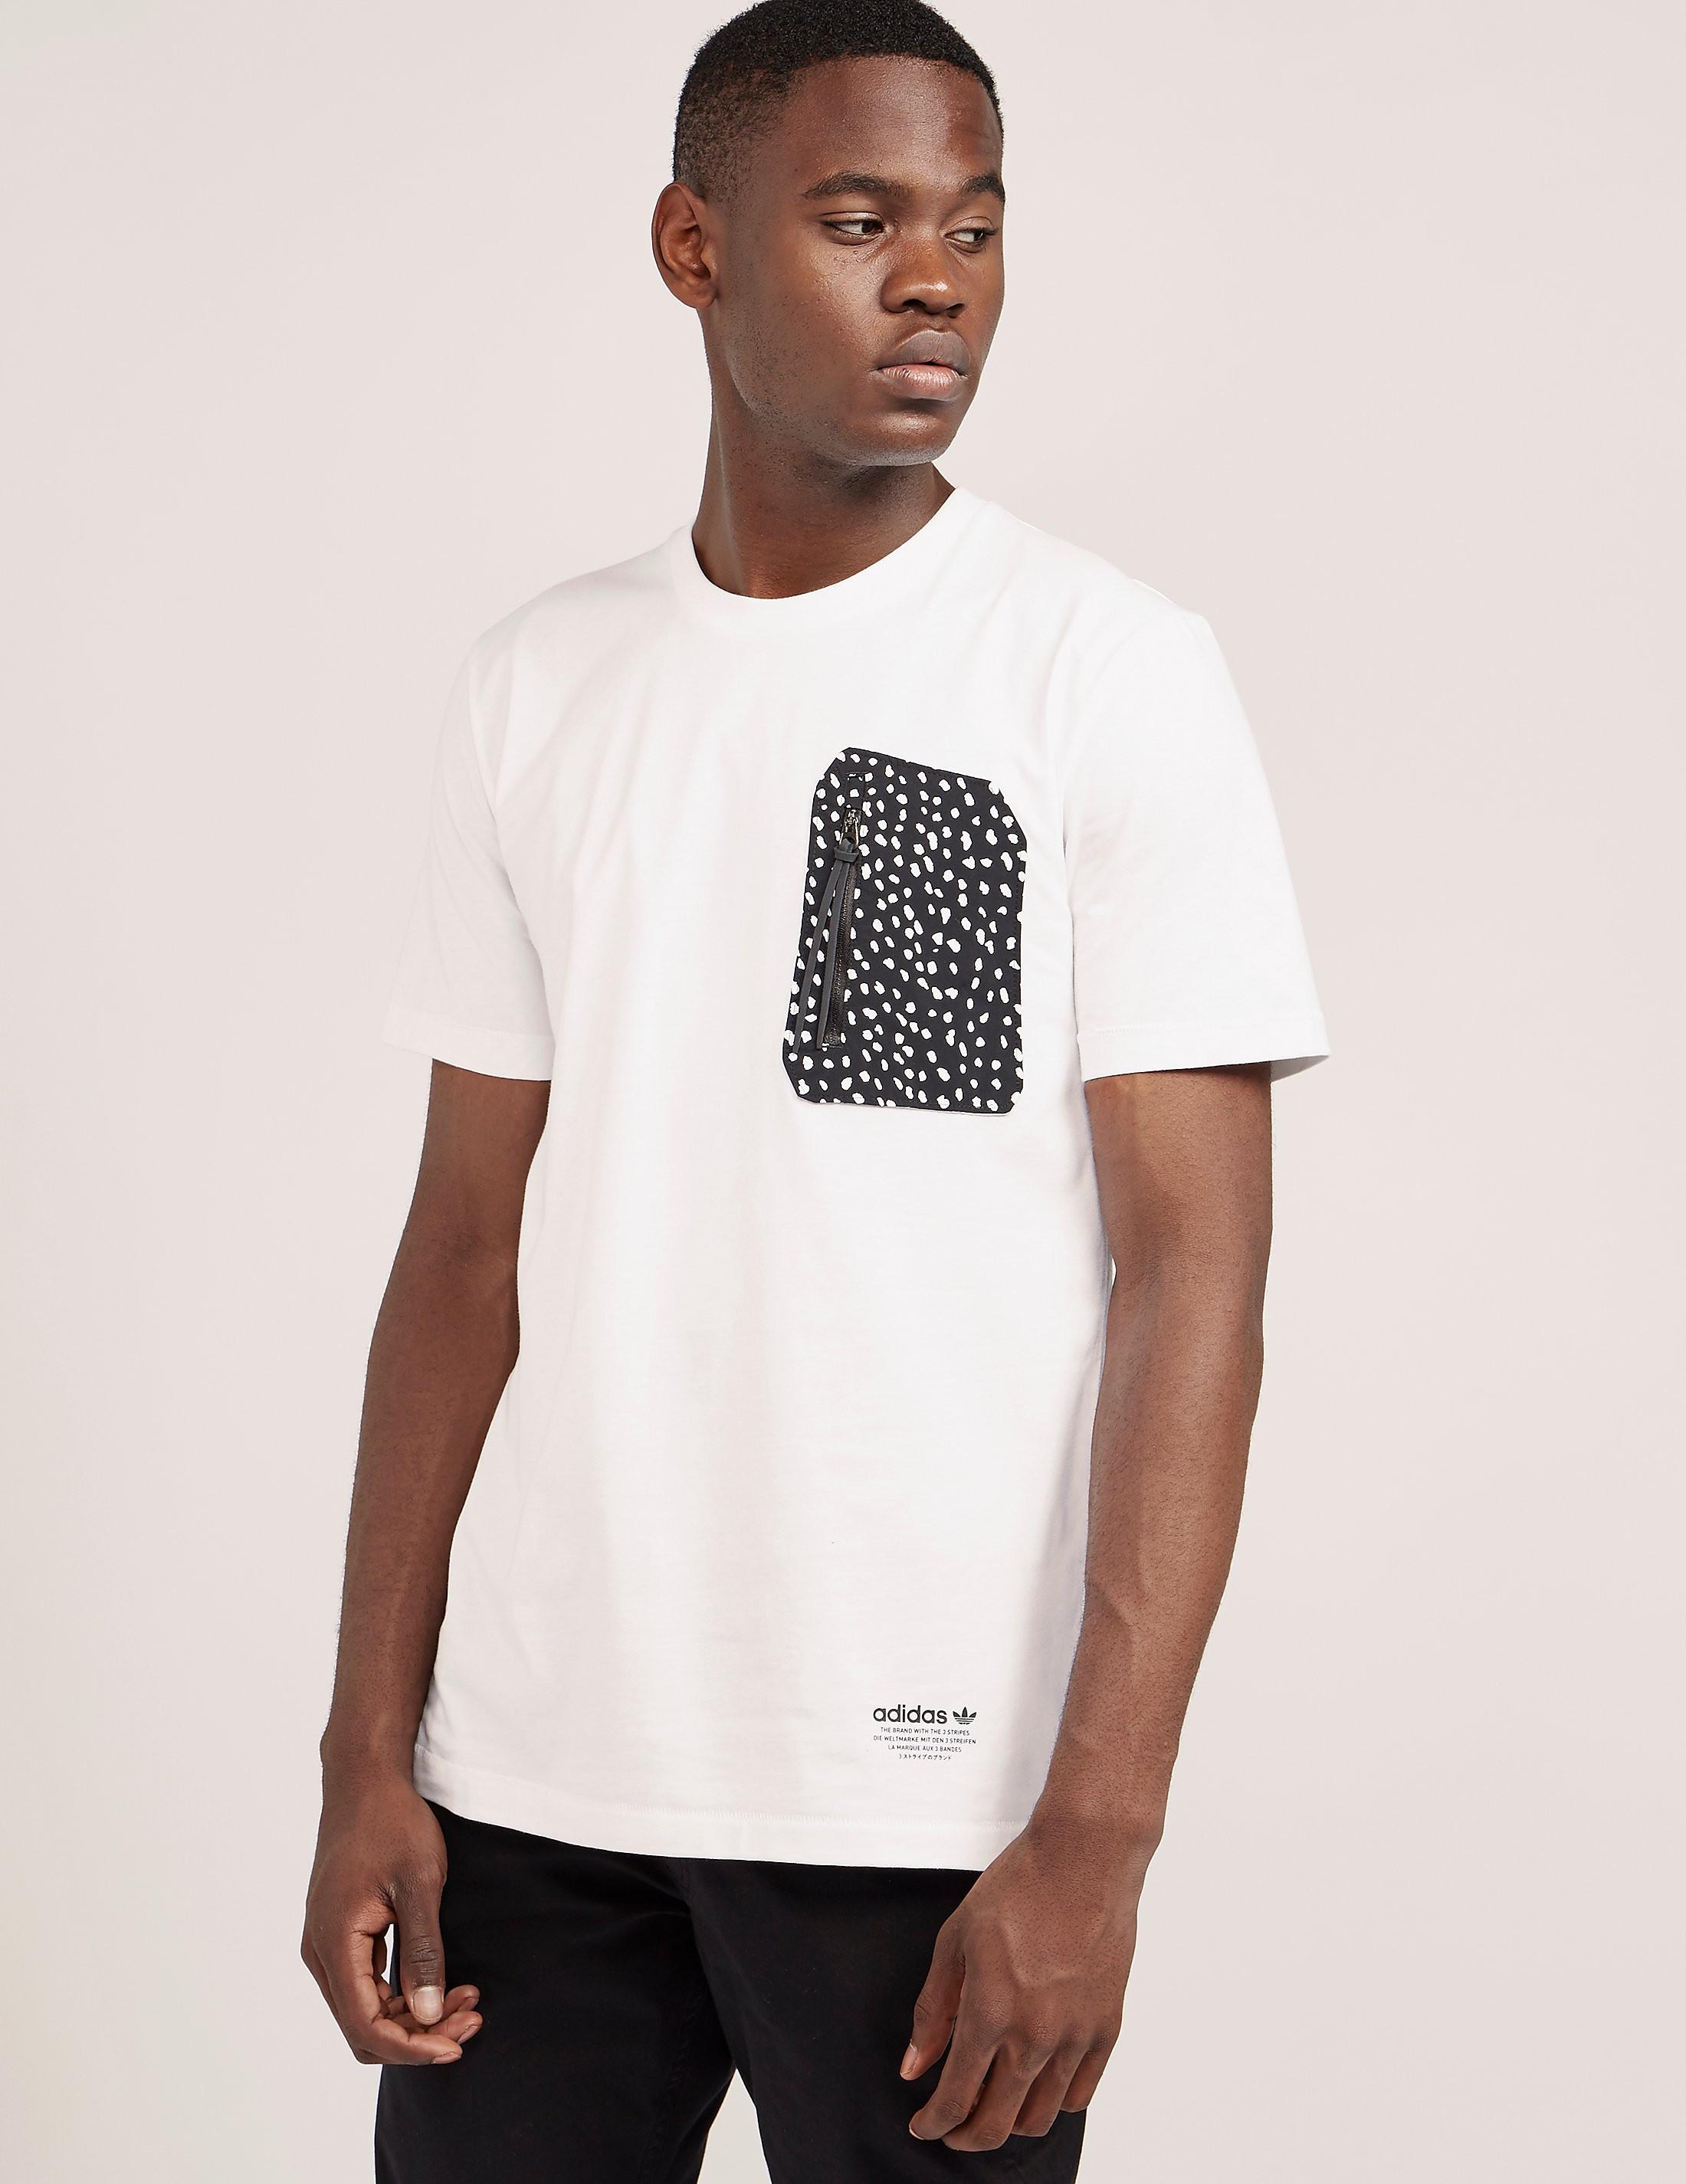 adidas Originals NMD Pocket Short Sleeve T-Shirt